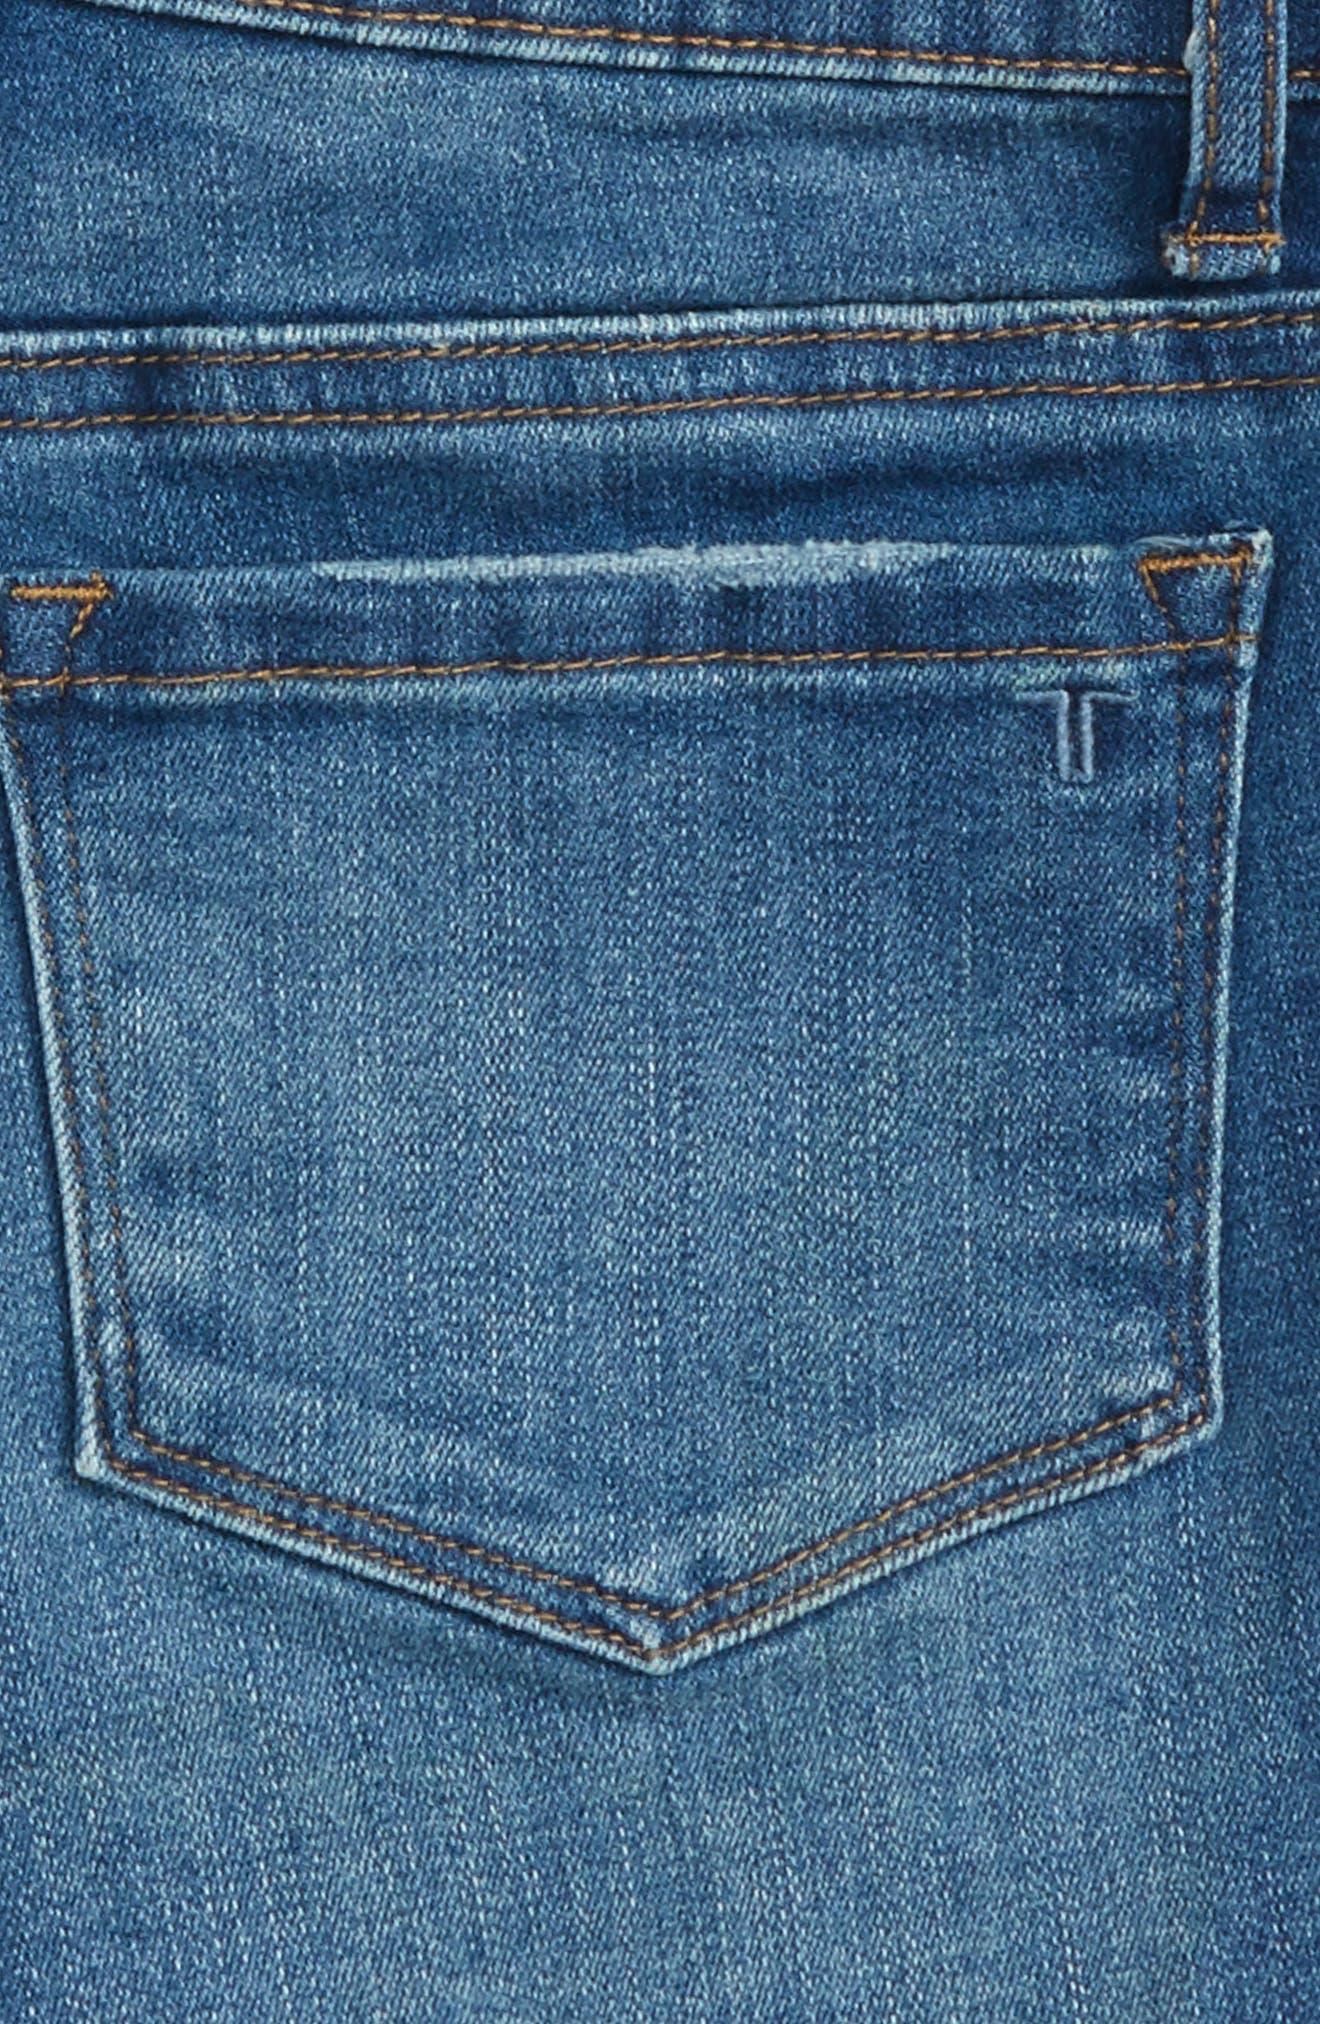 Alternate Image 3  - Tractr Distressed Cutoff Denim Shorts (Big Girls)